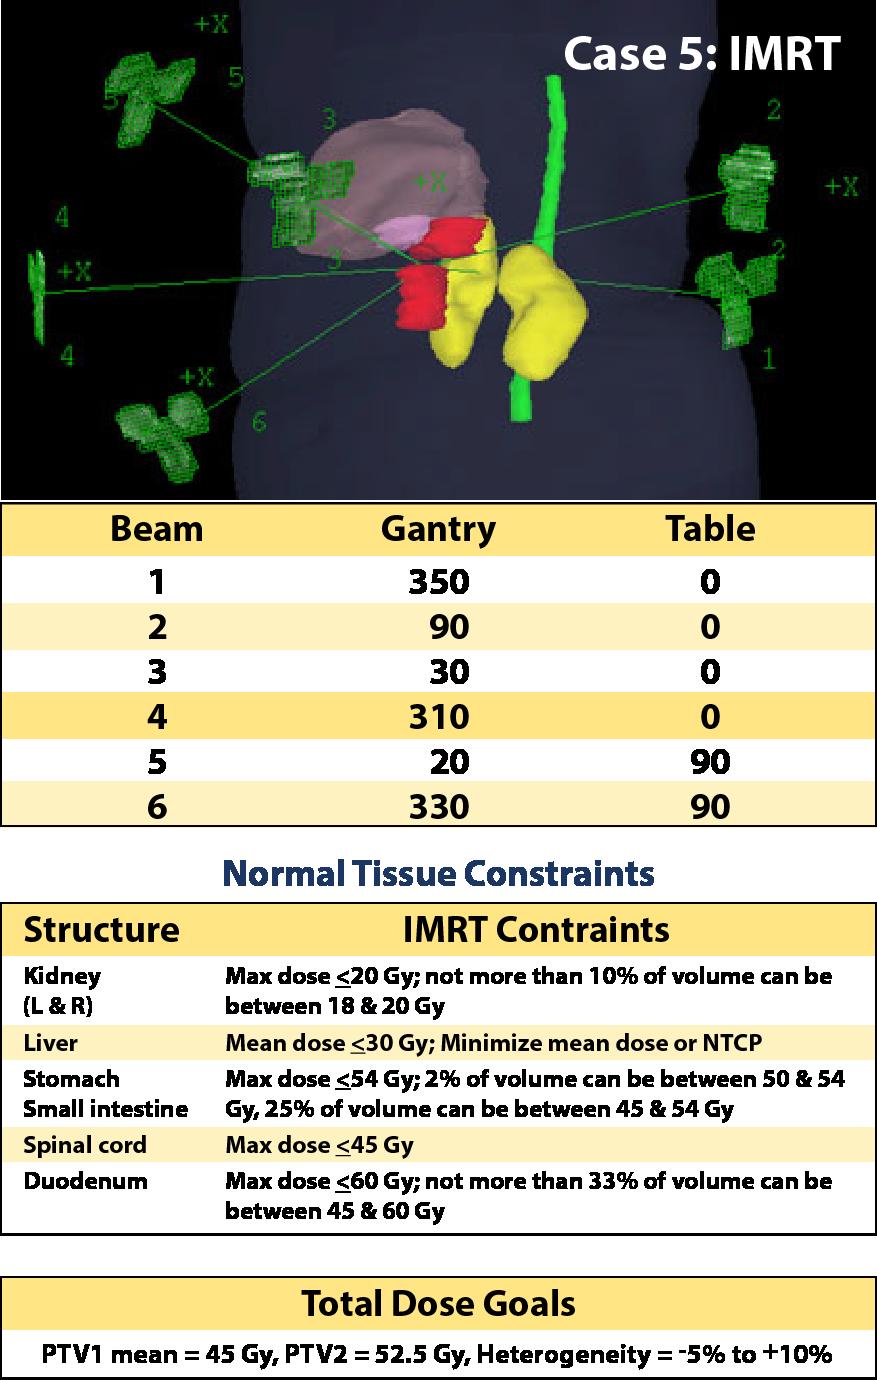 Case 5, IMRT planning parameters